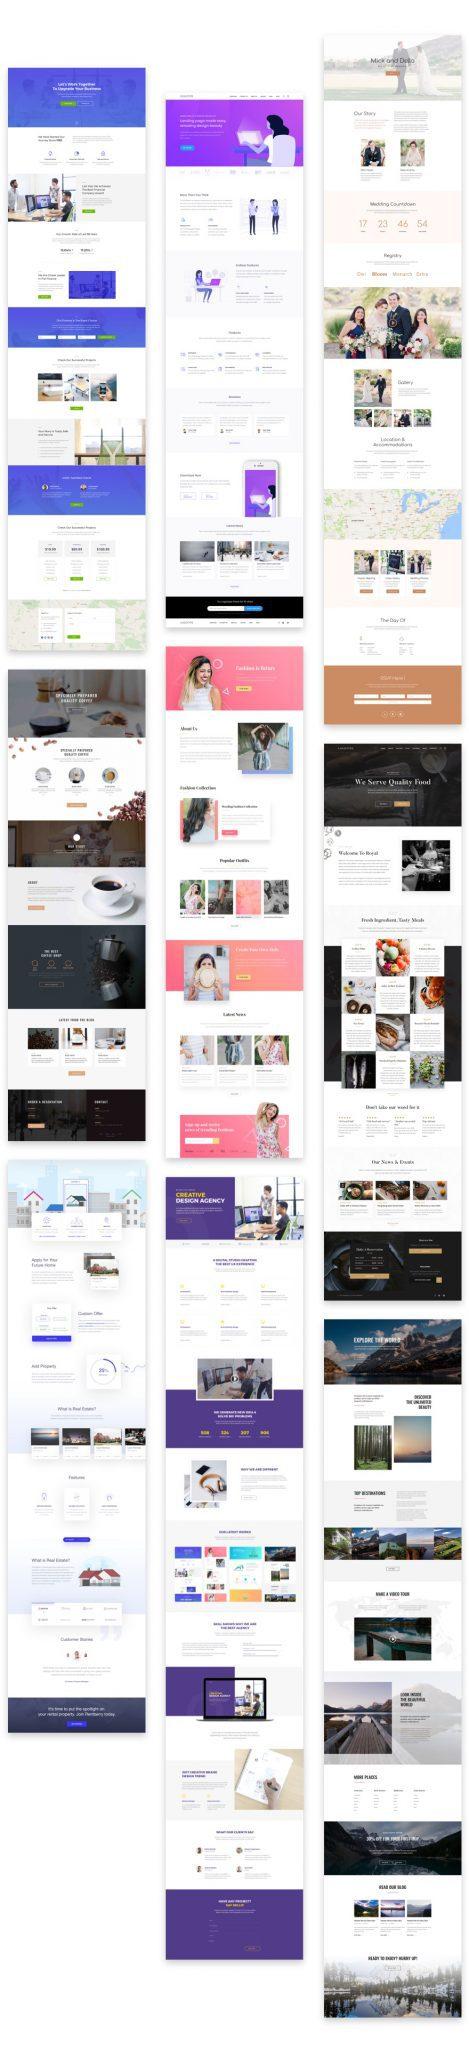 Elegant themes divi layout packs elegant divi layouts - Divi elegant theme ...